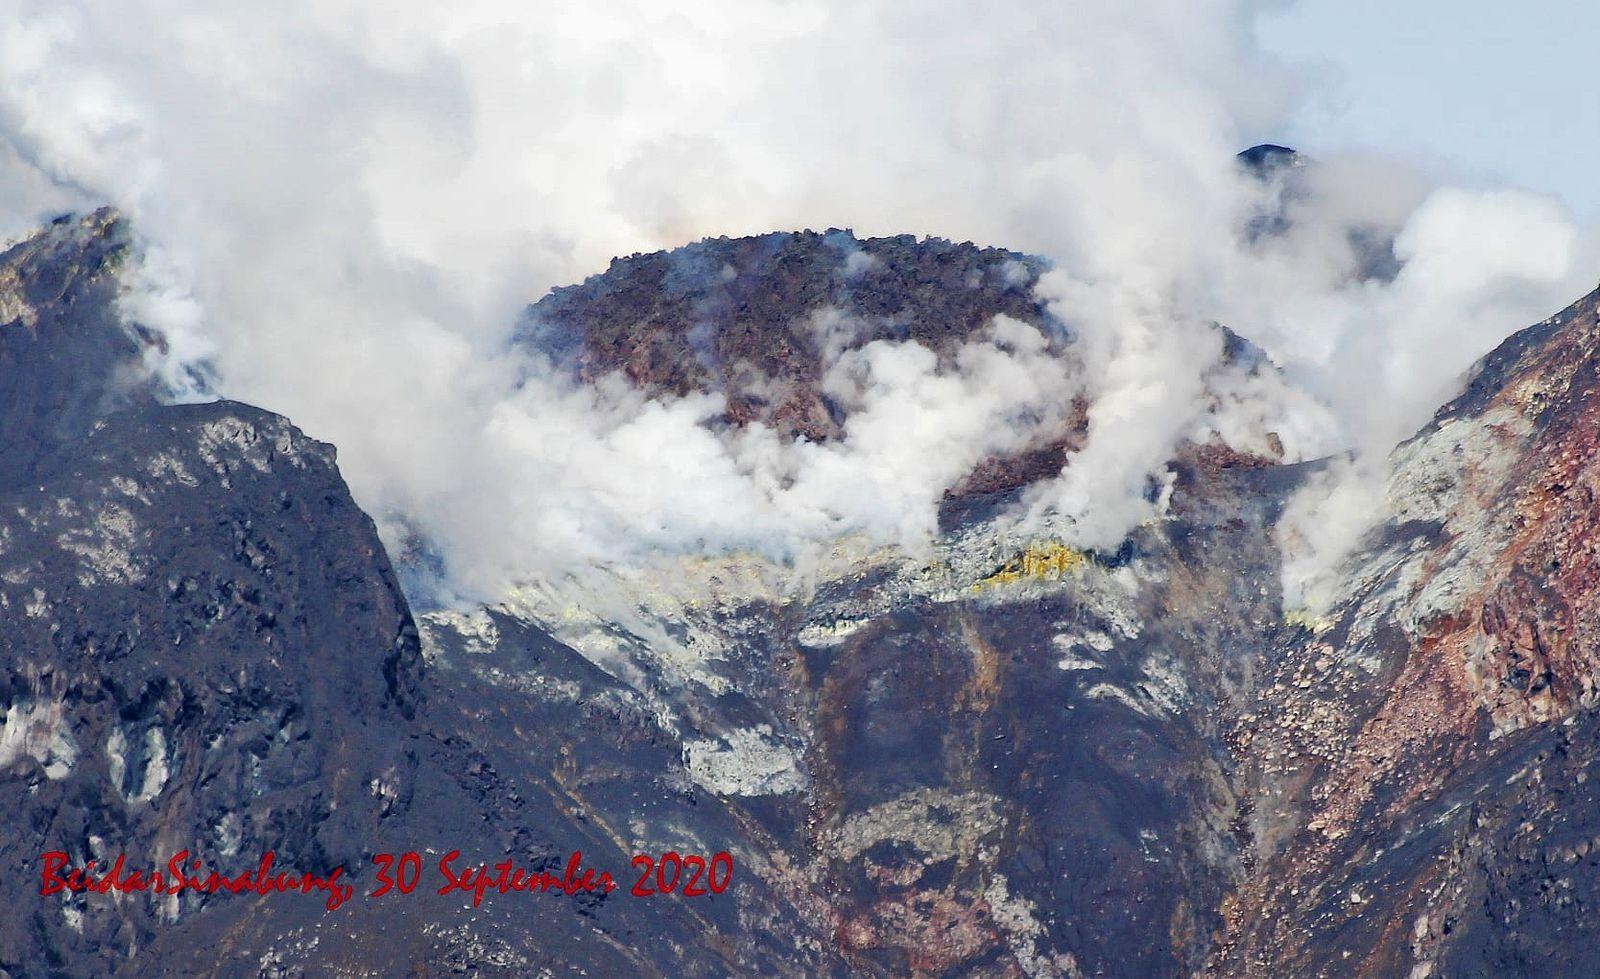 Sinabung - le dôme sommital le 30.09.2020 - photo Beidar Sinabung / F. Surbakti